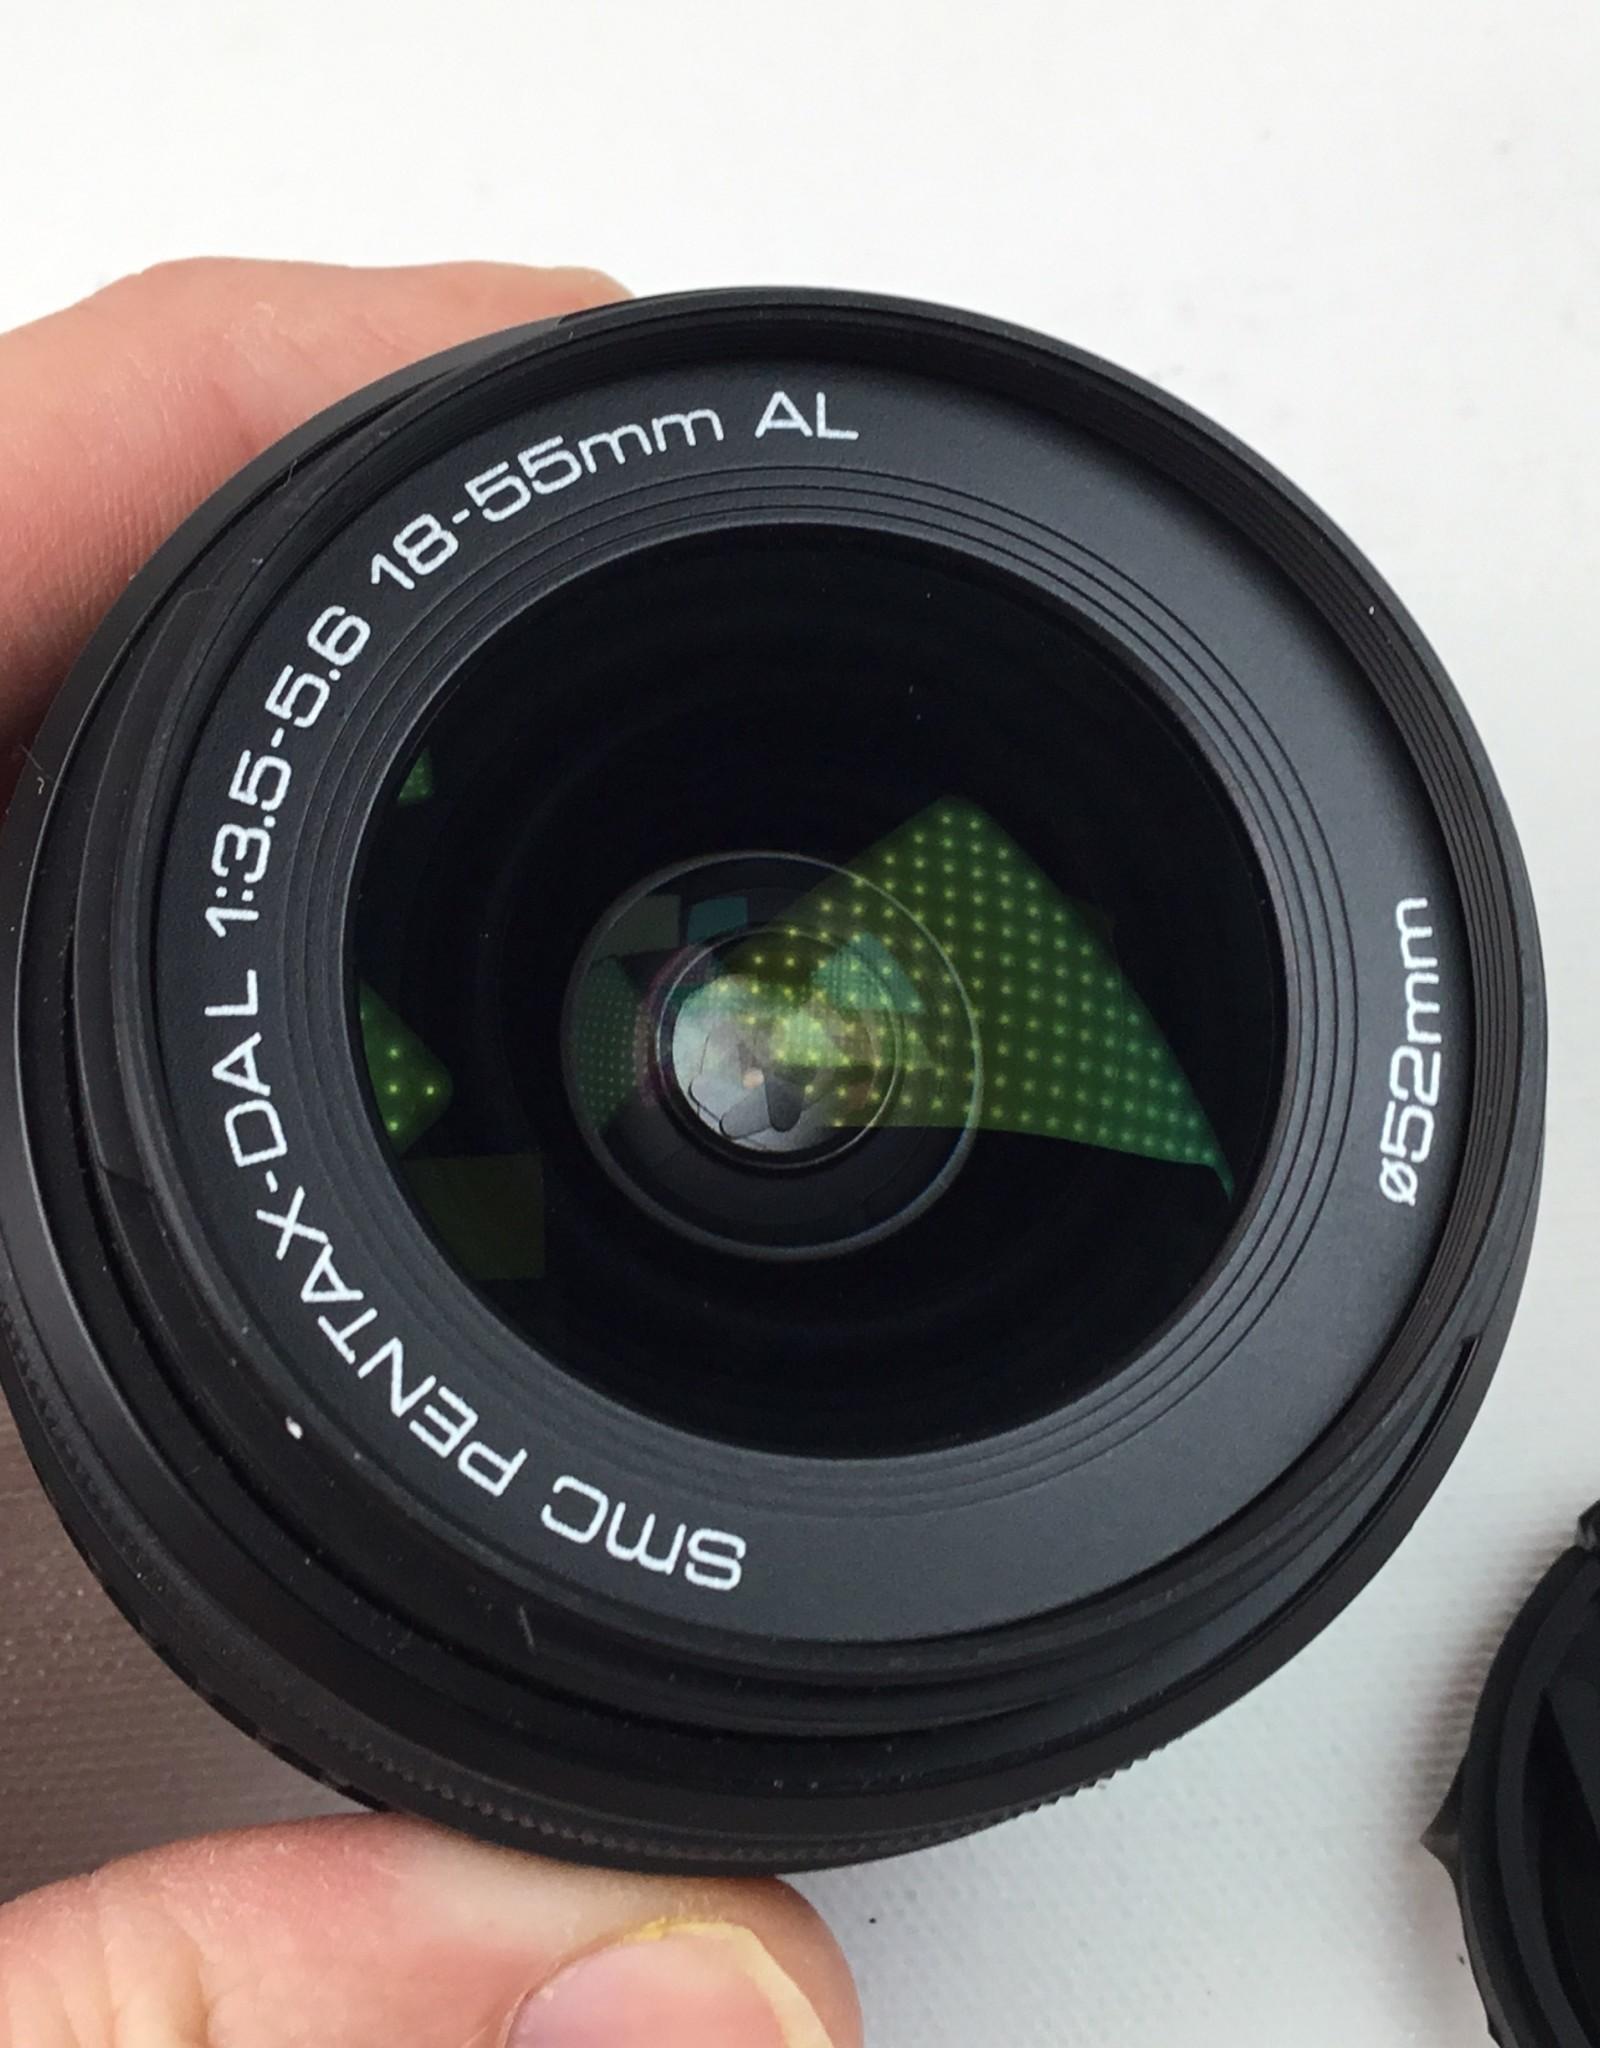 Pentax Pentax DAL 18-55mm f3.5-5.6 AL Lens Used EX